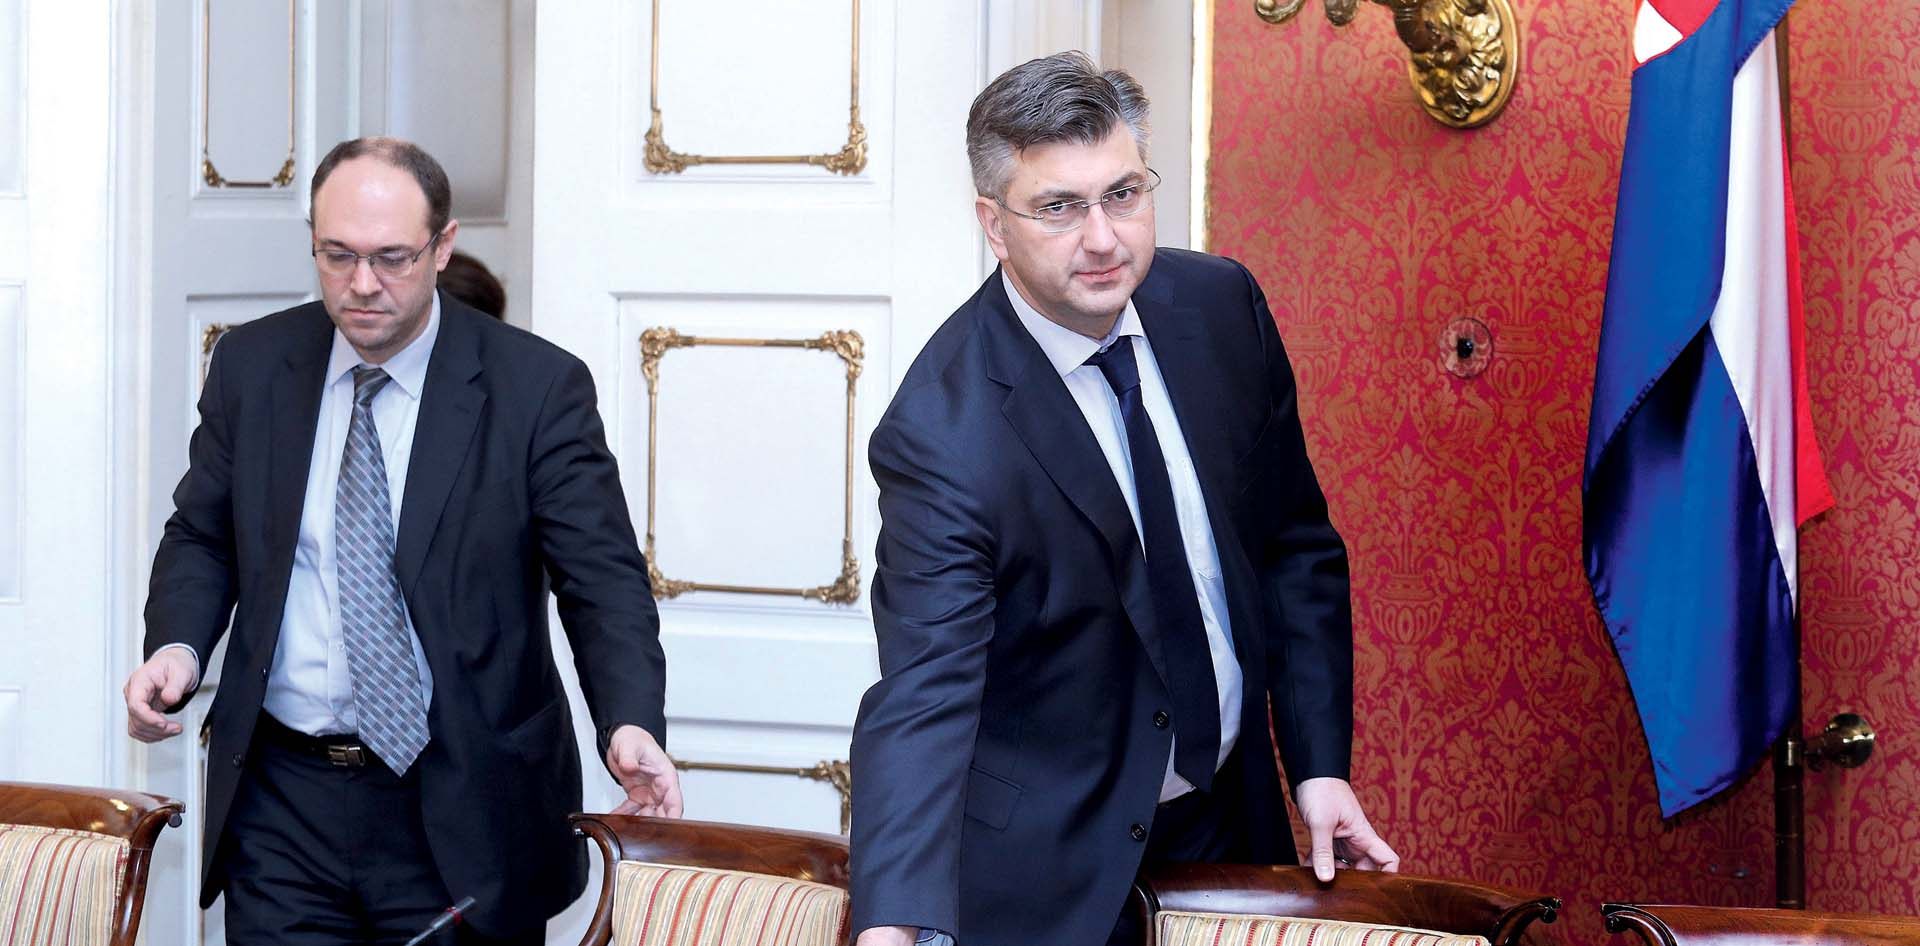 EUROPSKI DIPLOMATI: 'PLENKOVIĆ JE POSTAO SLAB PREMIJER'